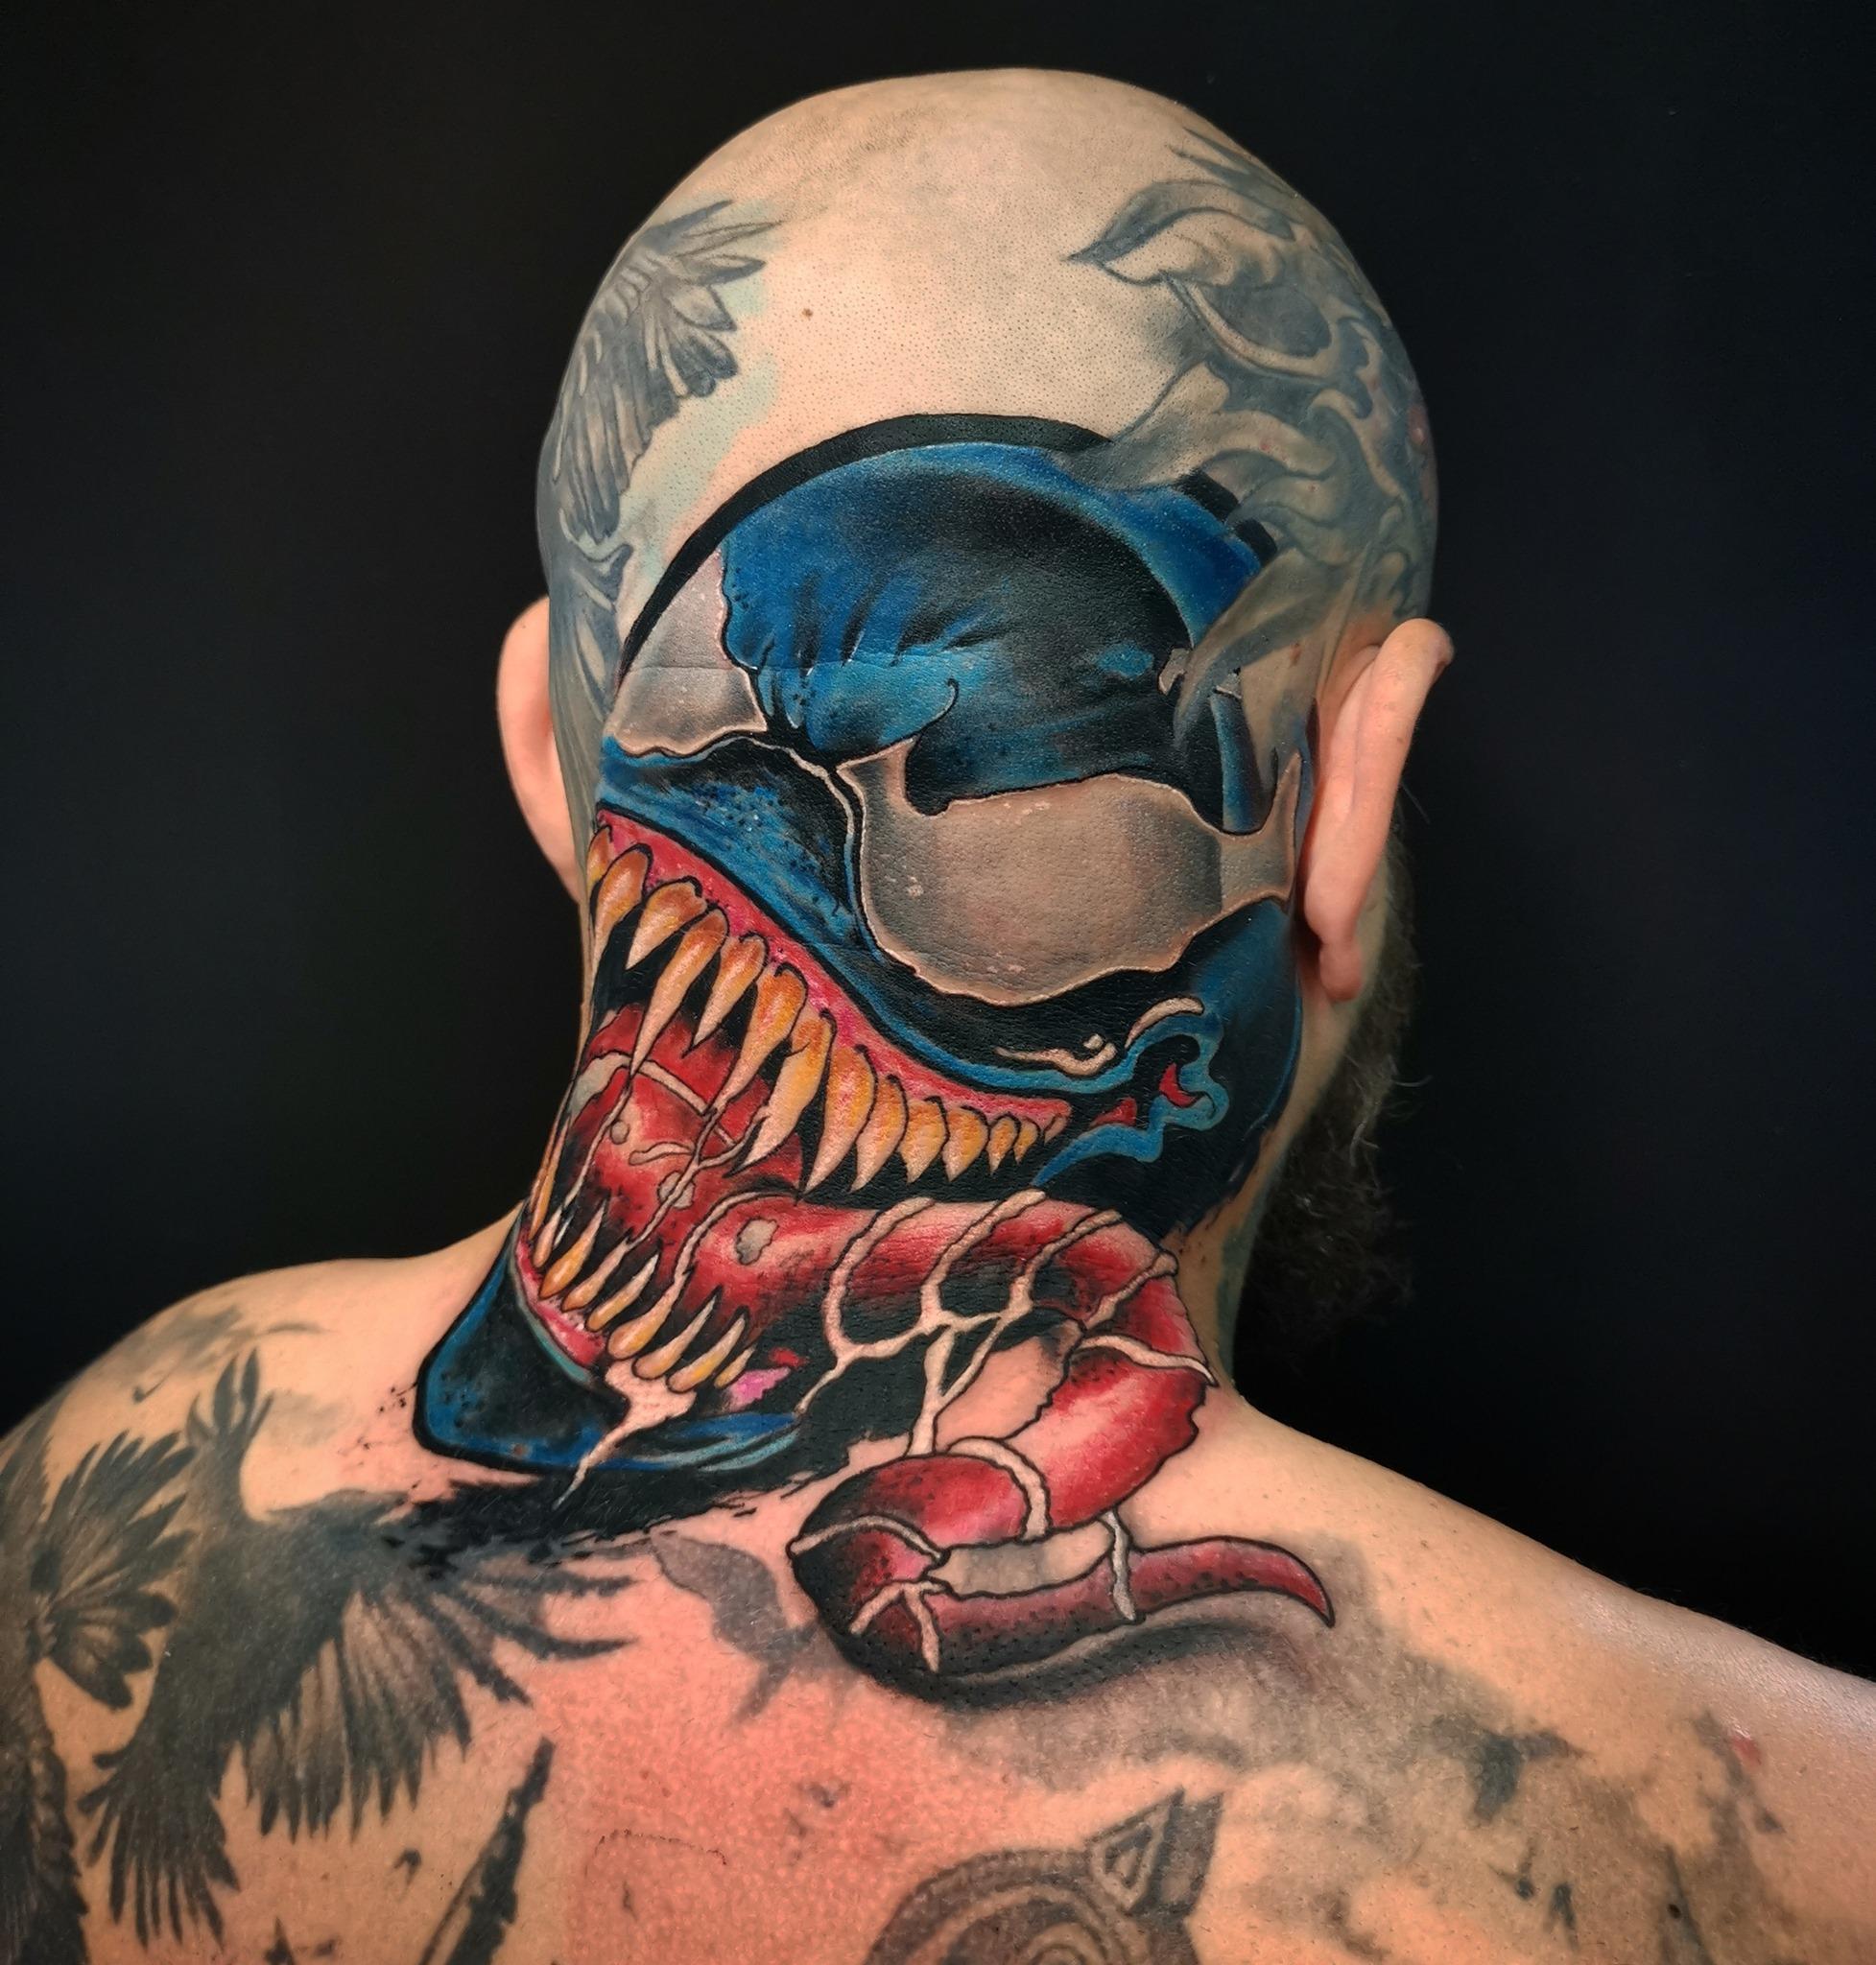 Inksearch tattoo Mateusz Kopała